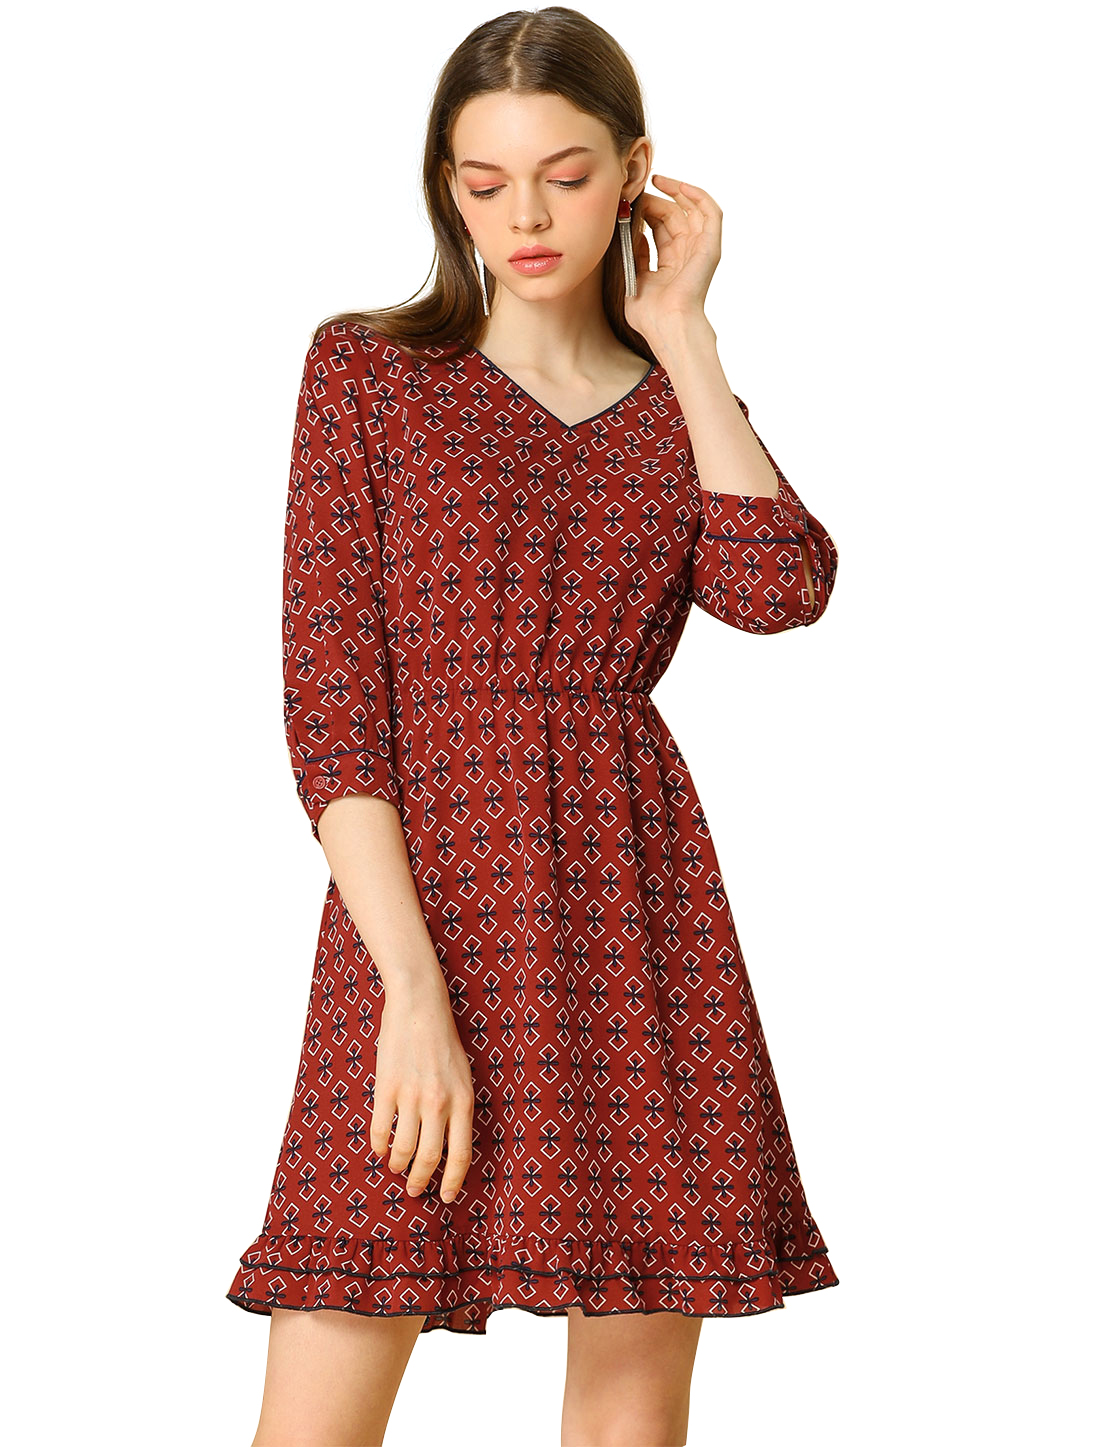 Women's 3/4 Sleeve V Neck Ruffle Hem Geometric Motifs Flare Chiffon Dress Red XL